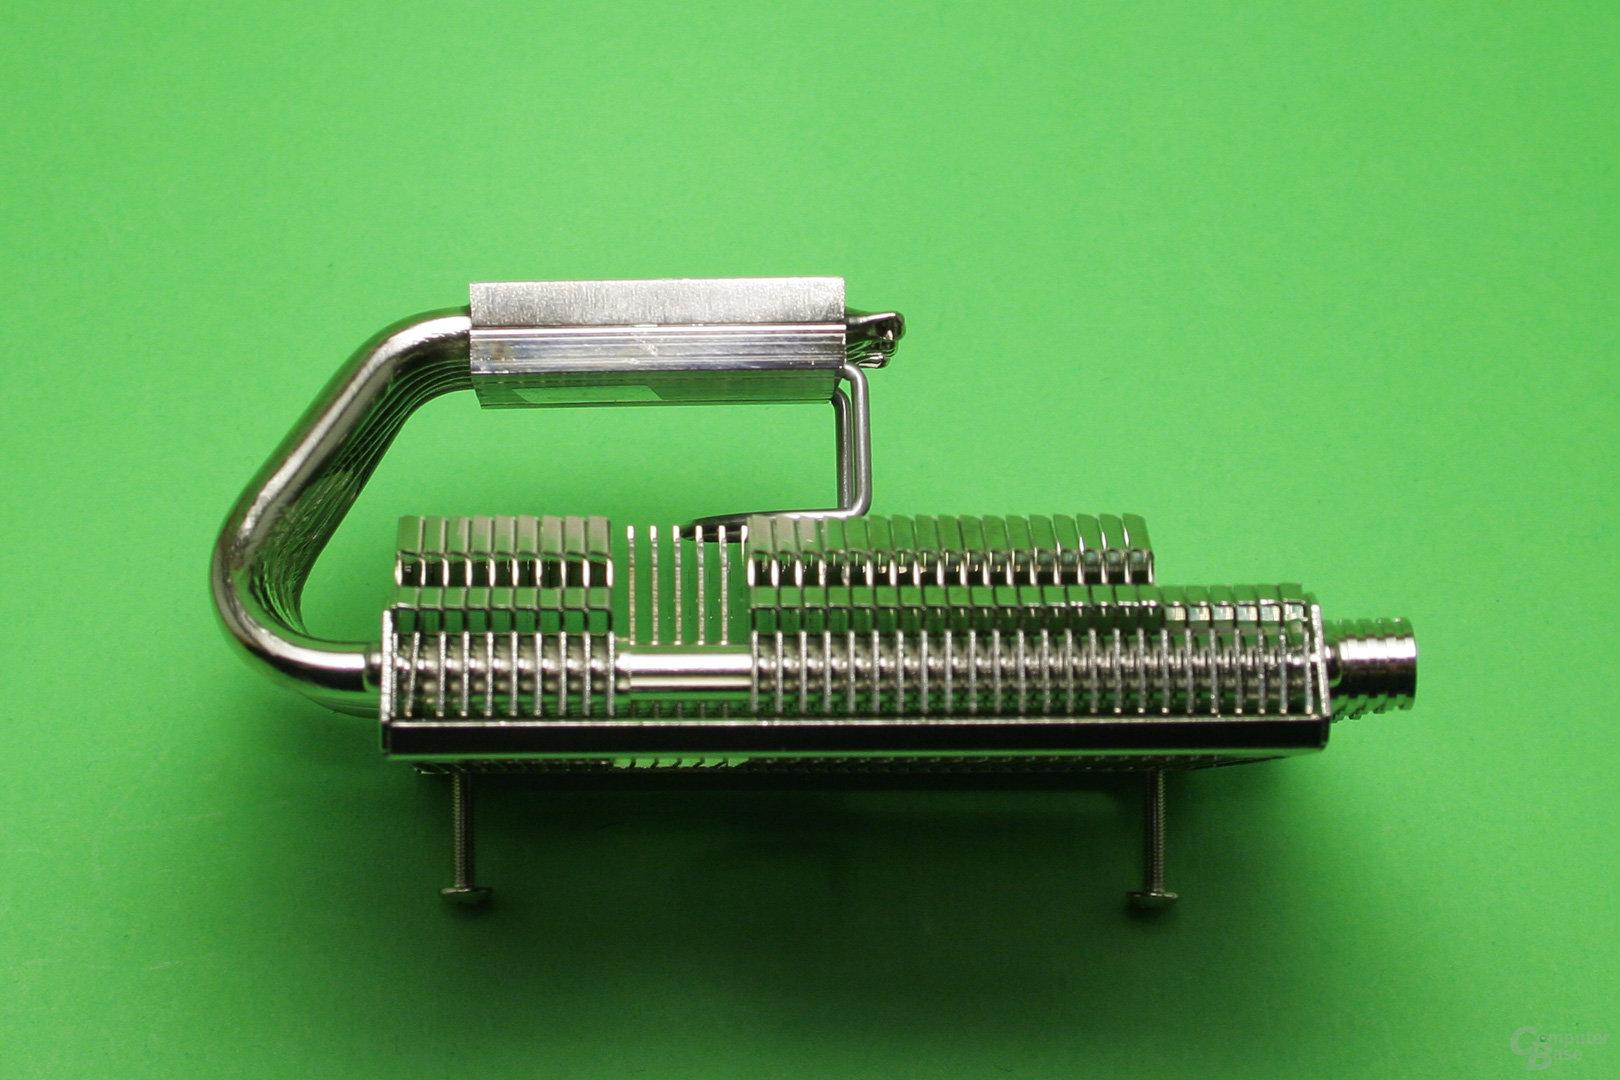 Thermalright AXP-100RH: Ein Metallbügel stabilisiert den Radiator